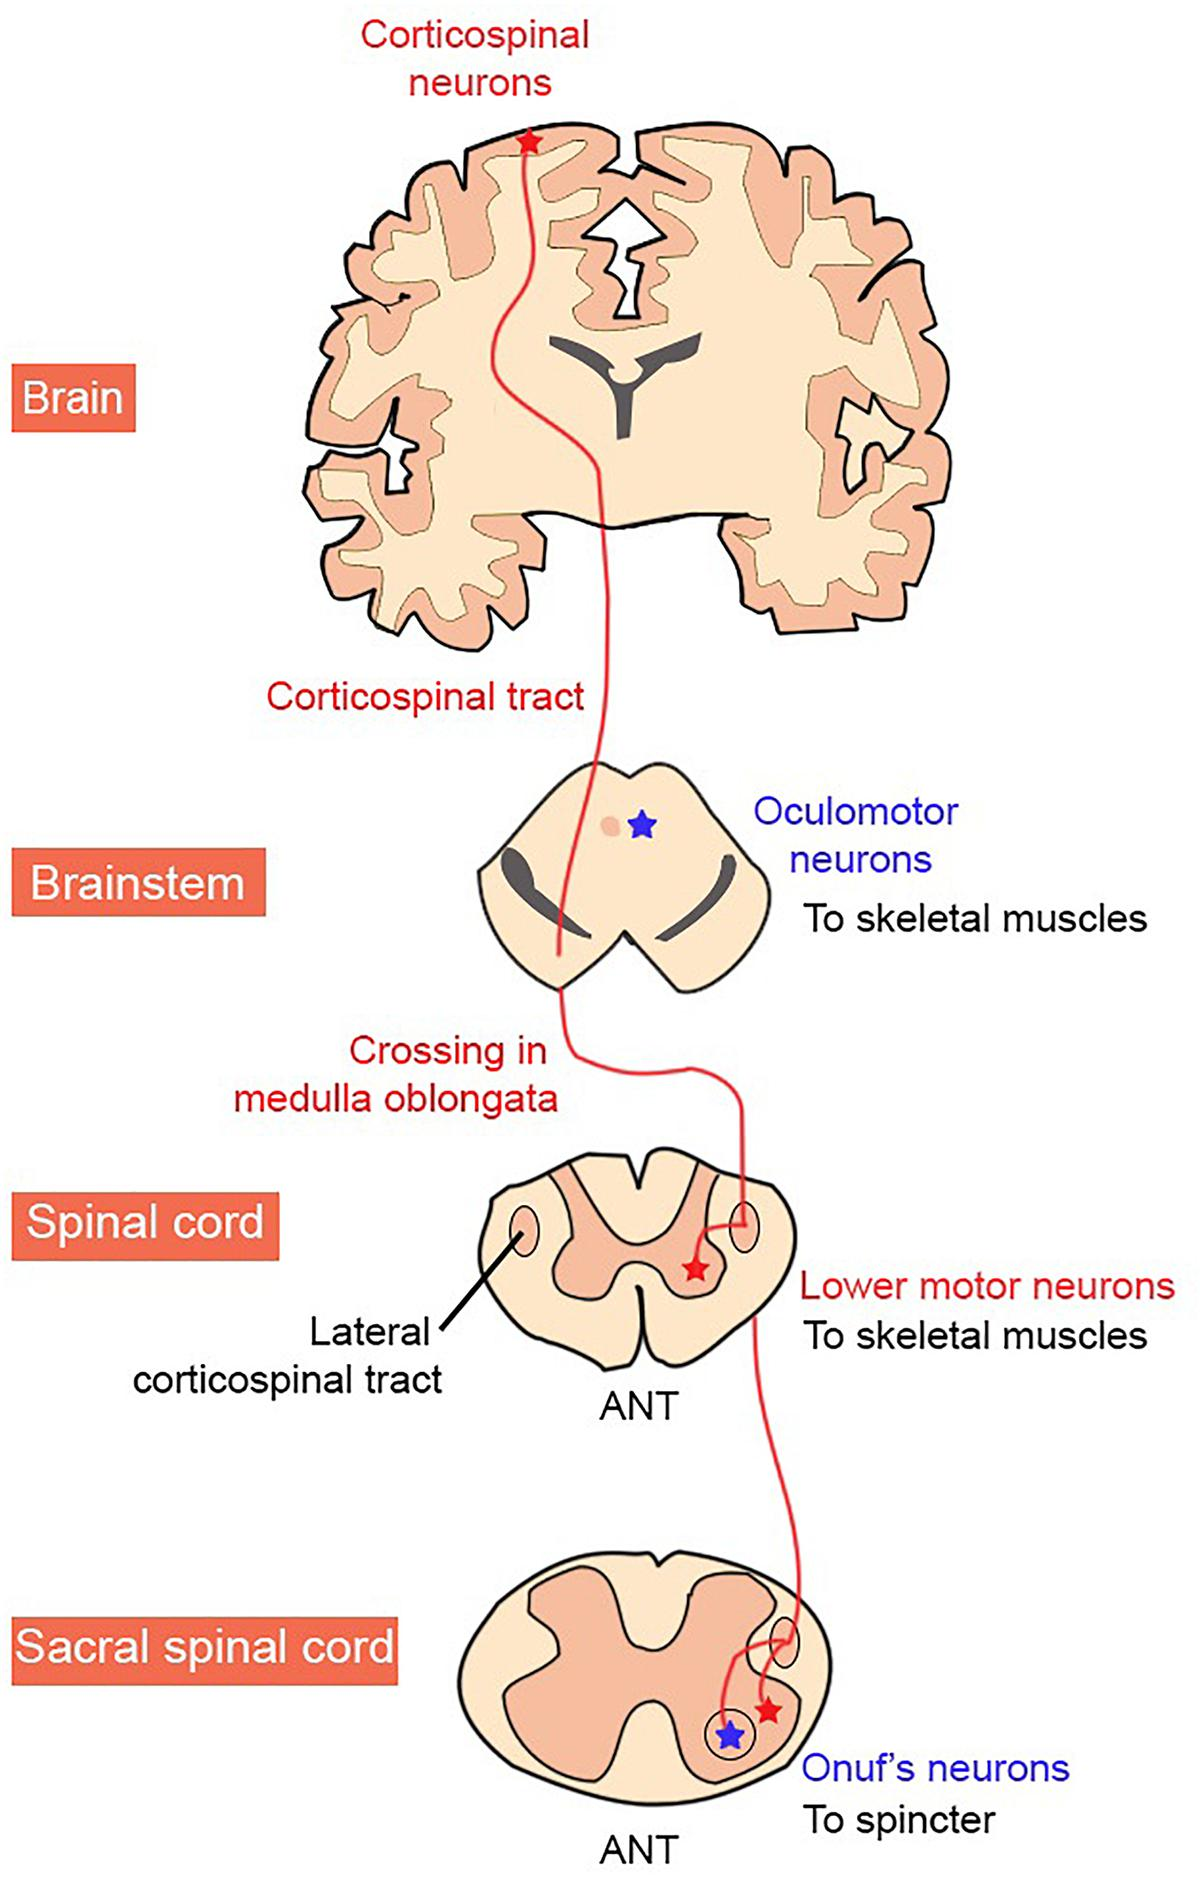 Lower Motor Neuron 7th Nerve Palsy